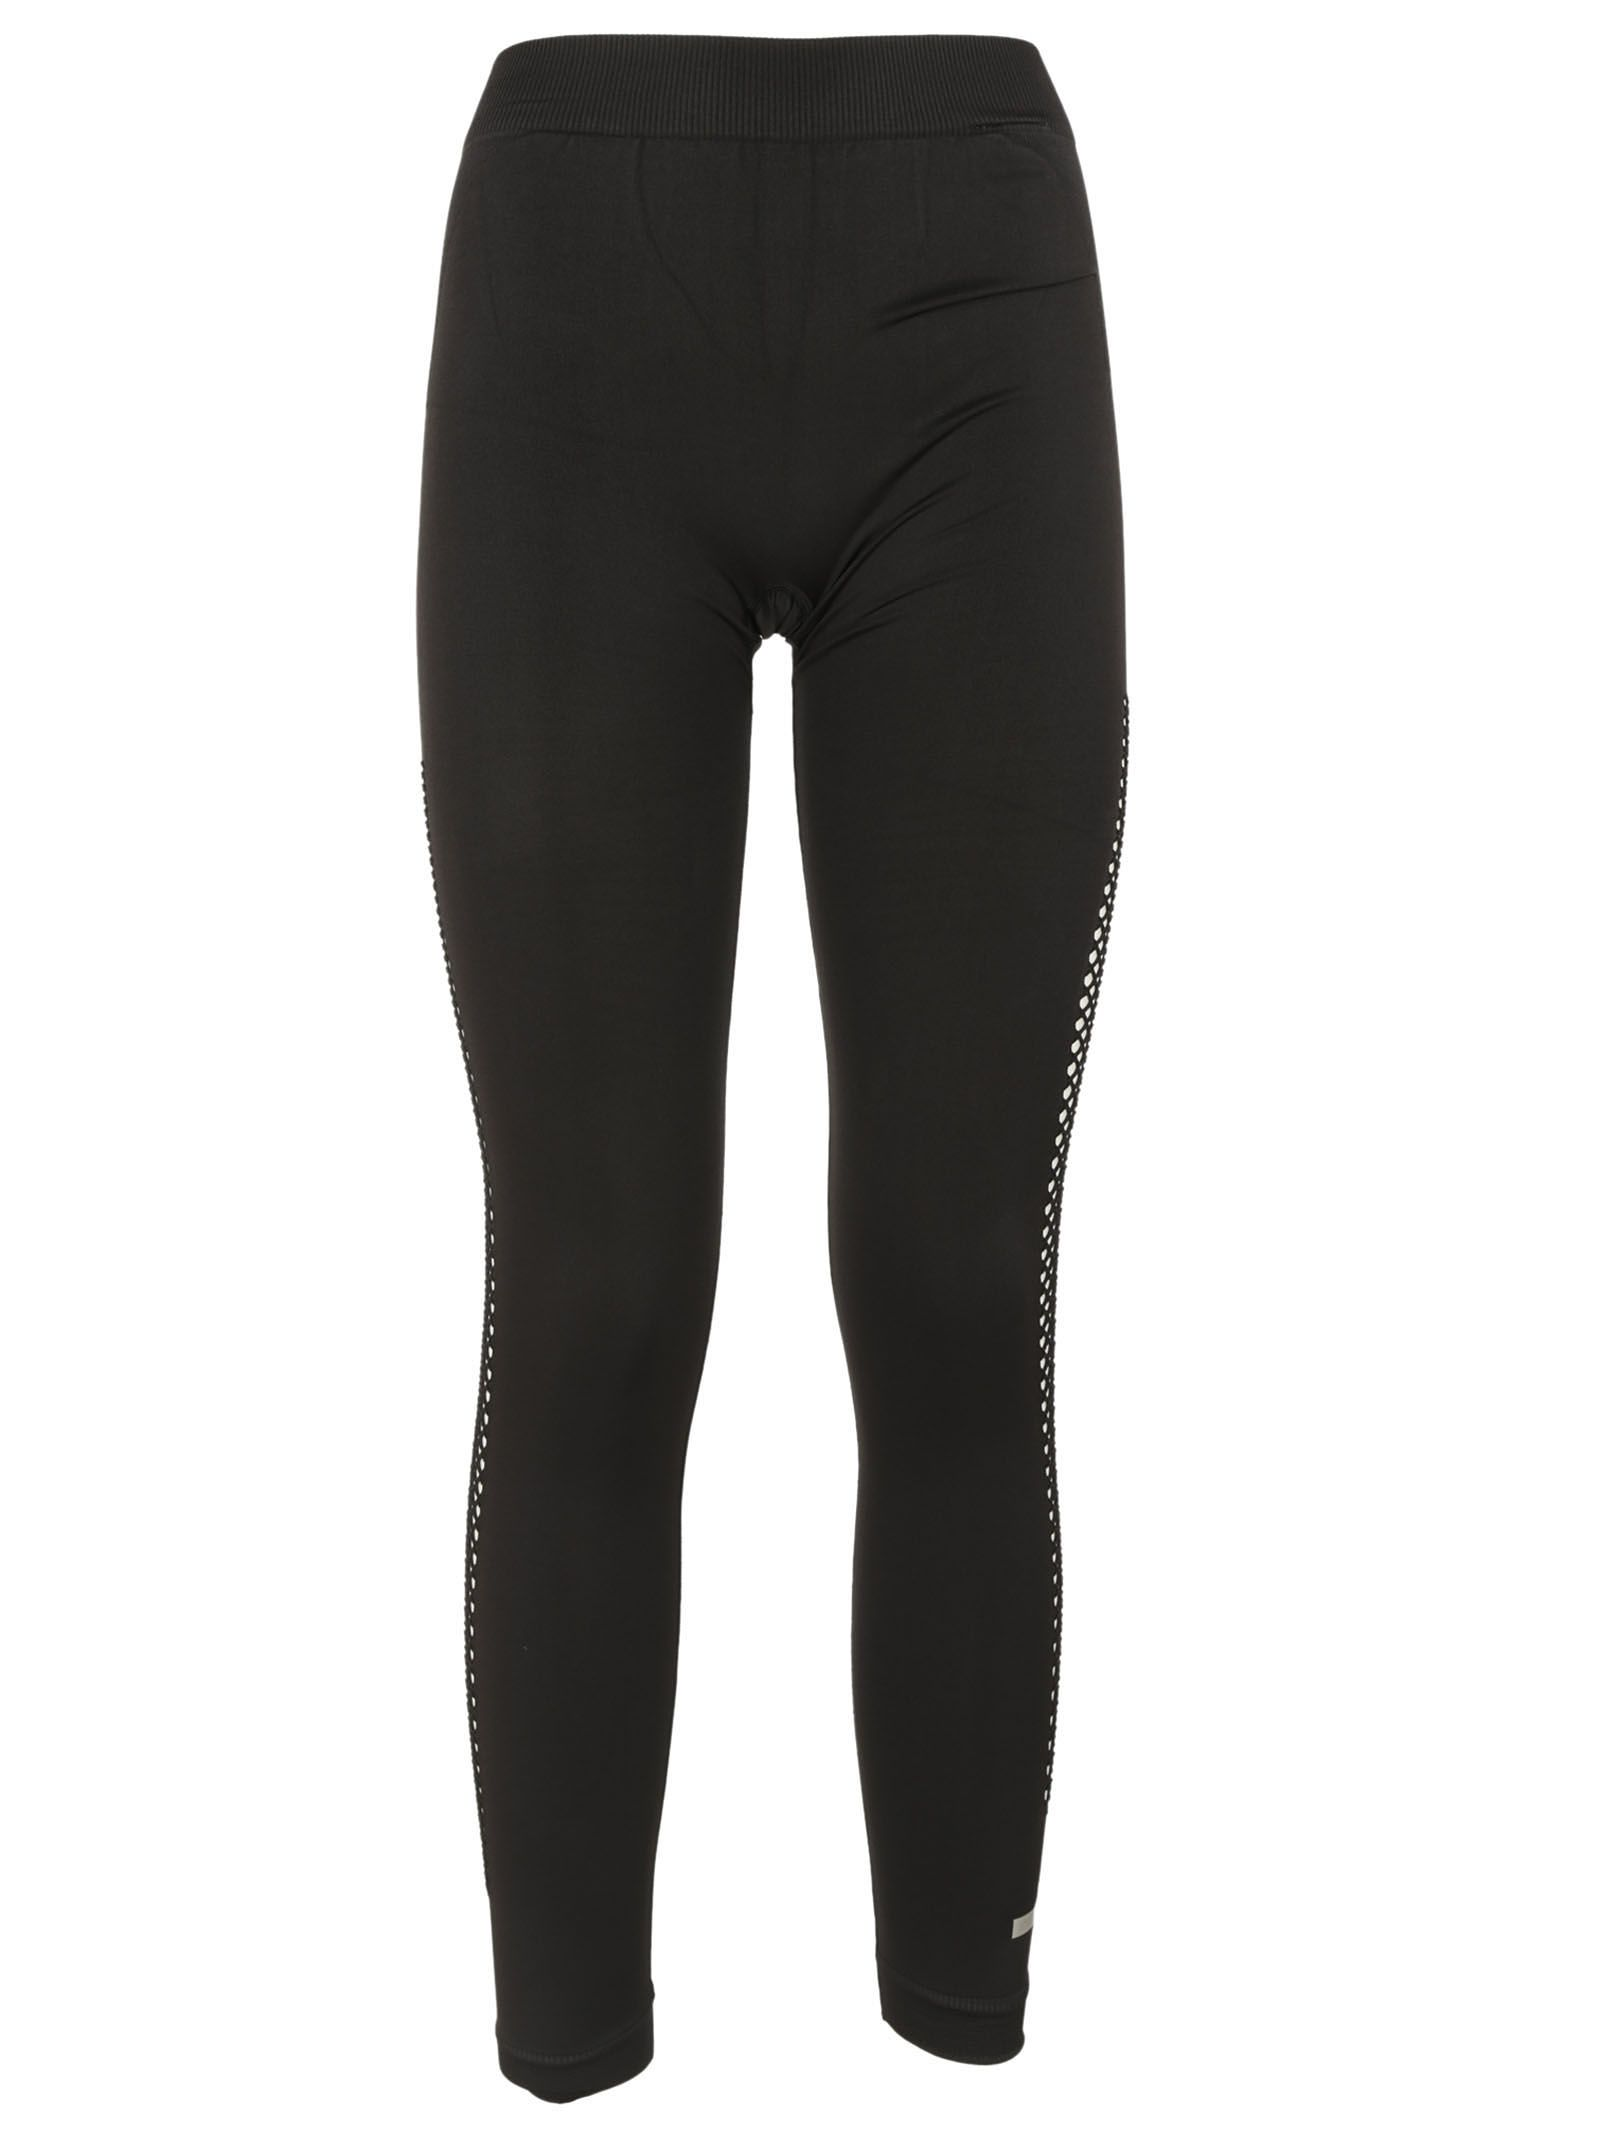 Adidas by Stella McCartney Mesh Tights Leggings